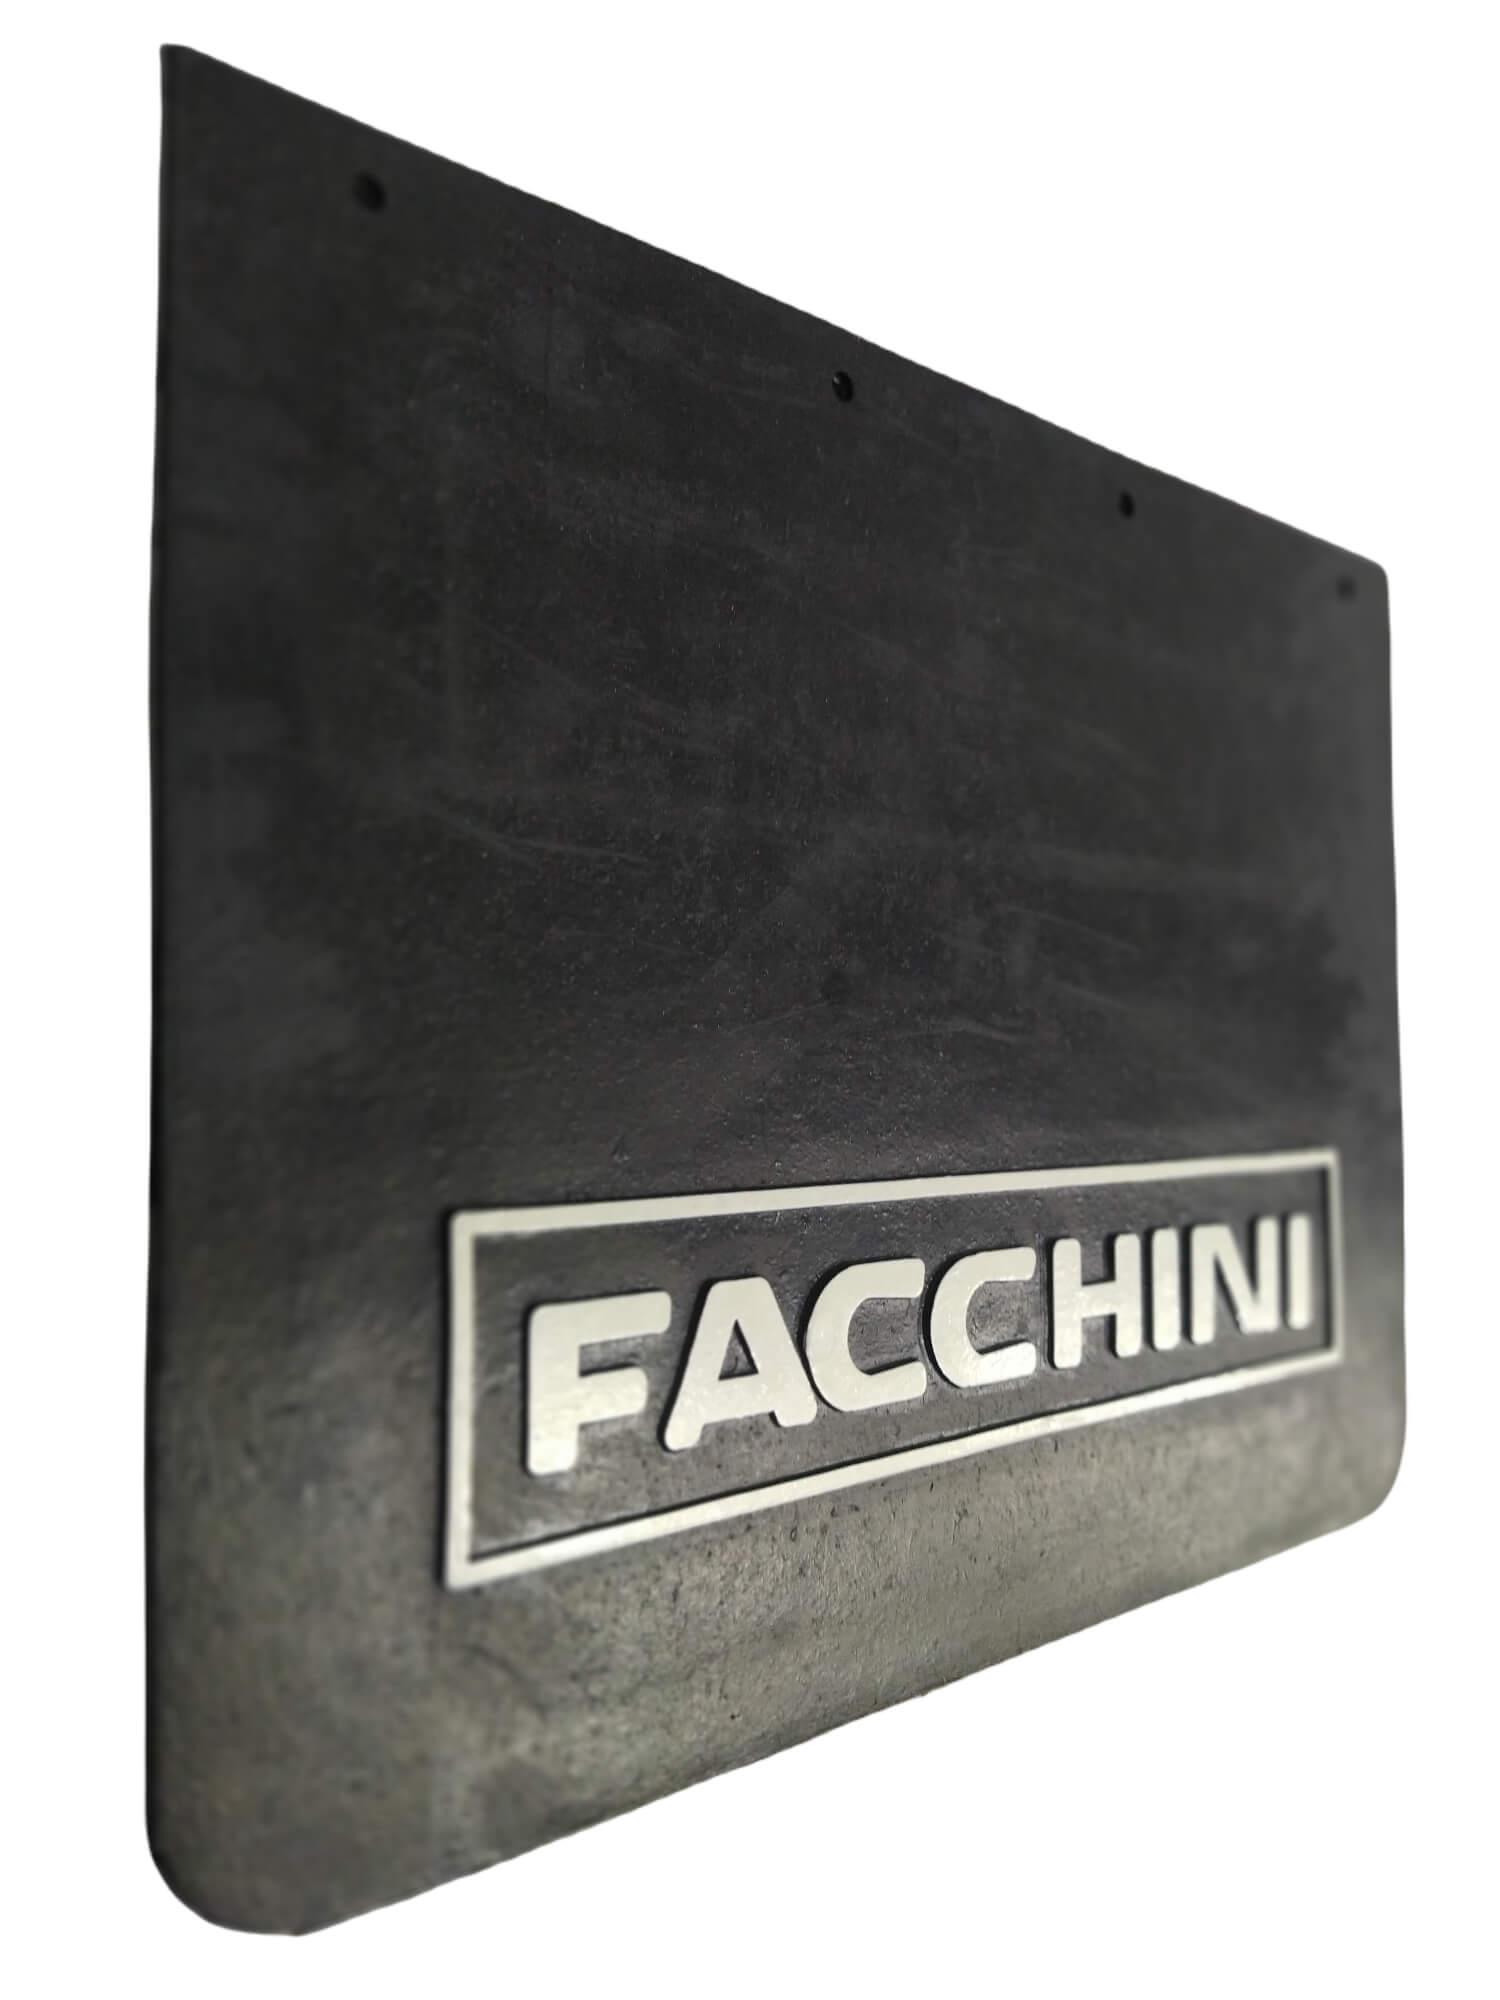 2 Parabarro Borracha Carreta Facchini 59 X 46 Cm Lameiro